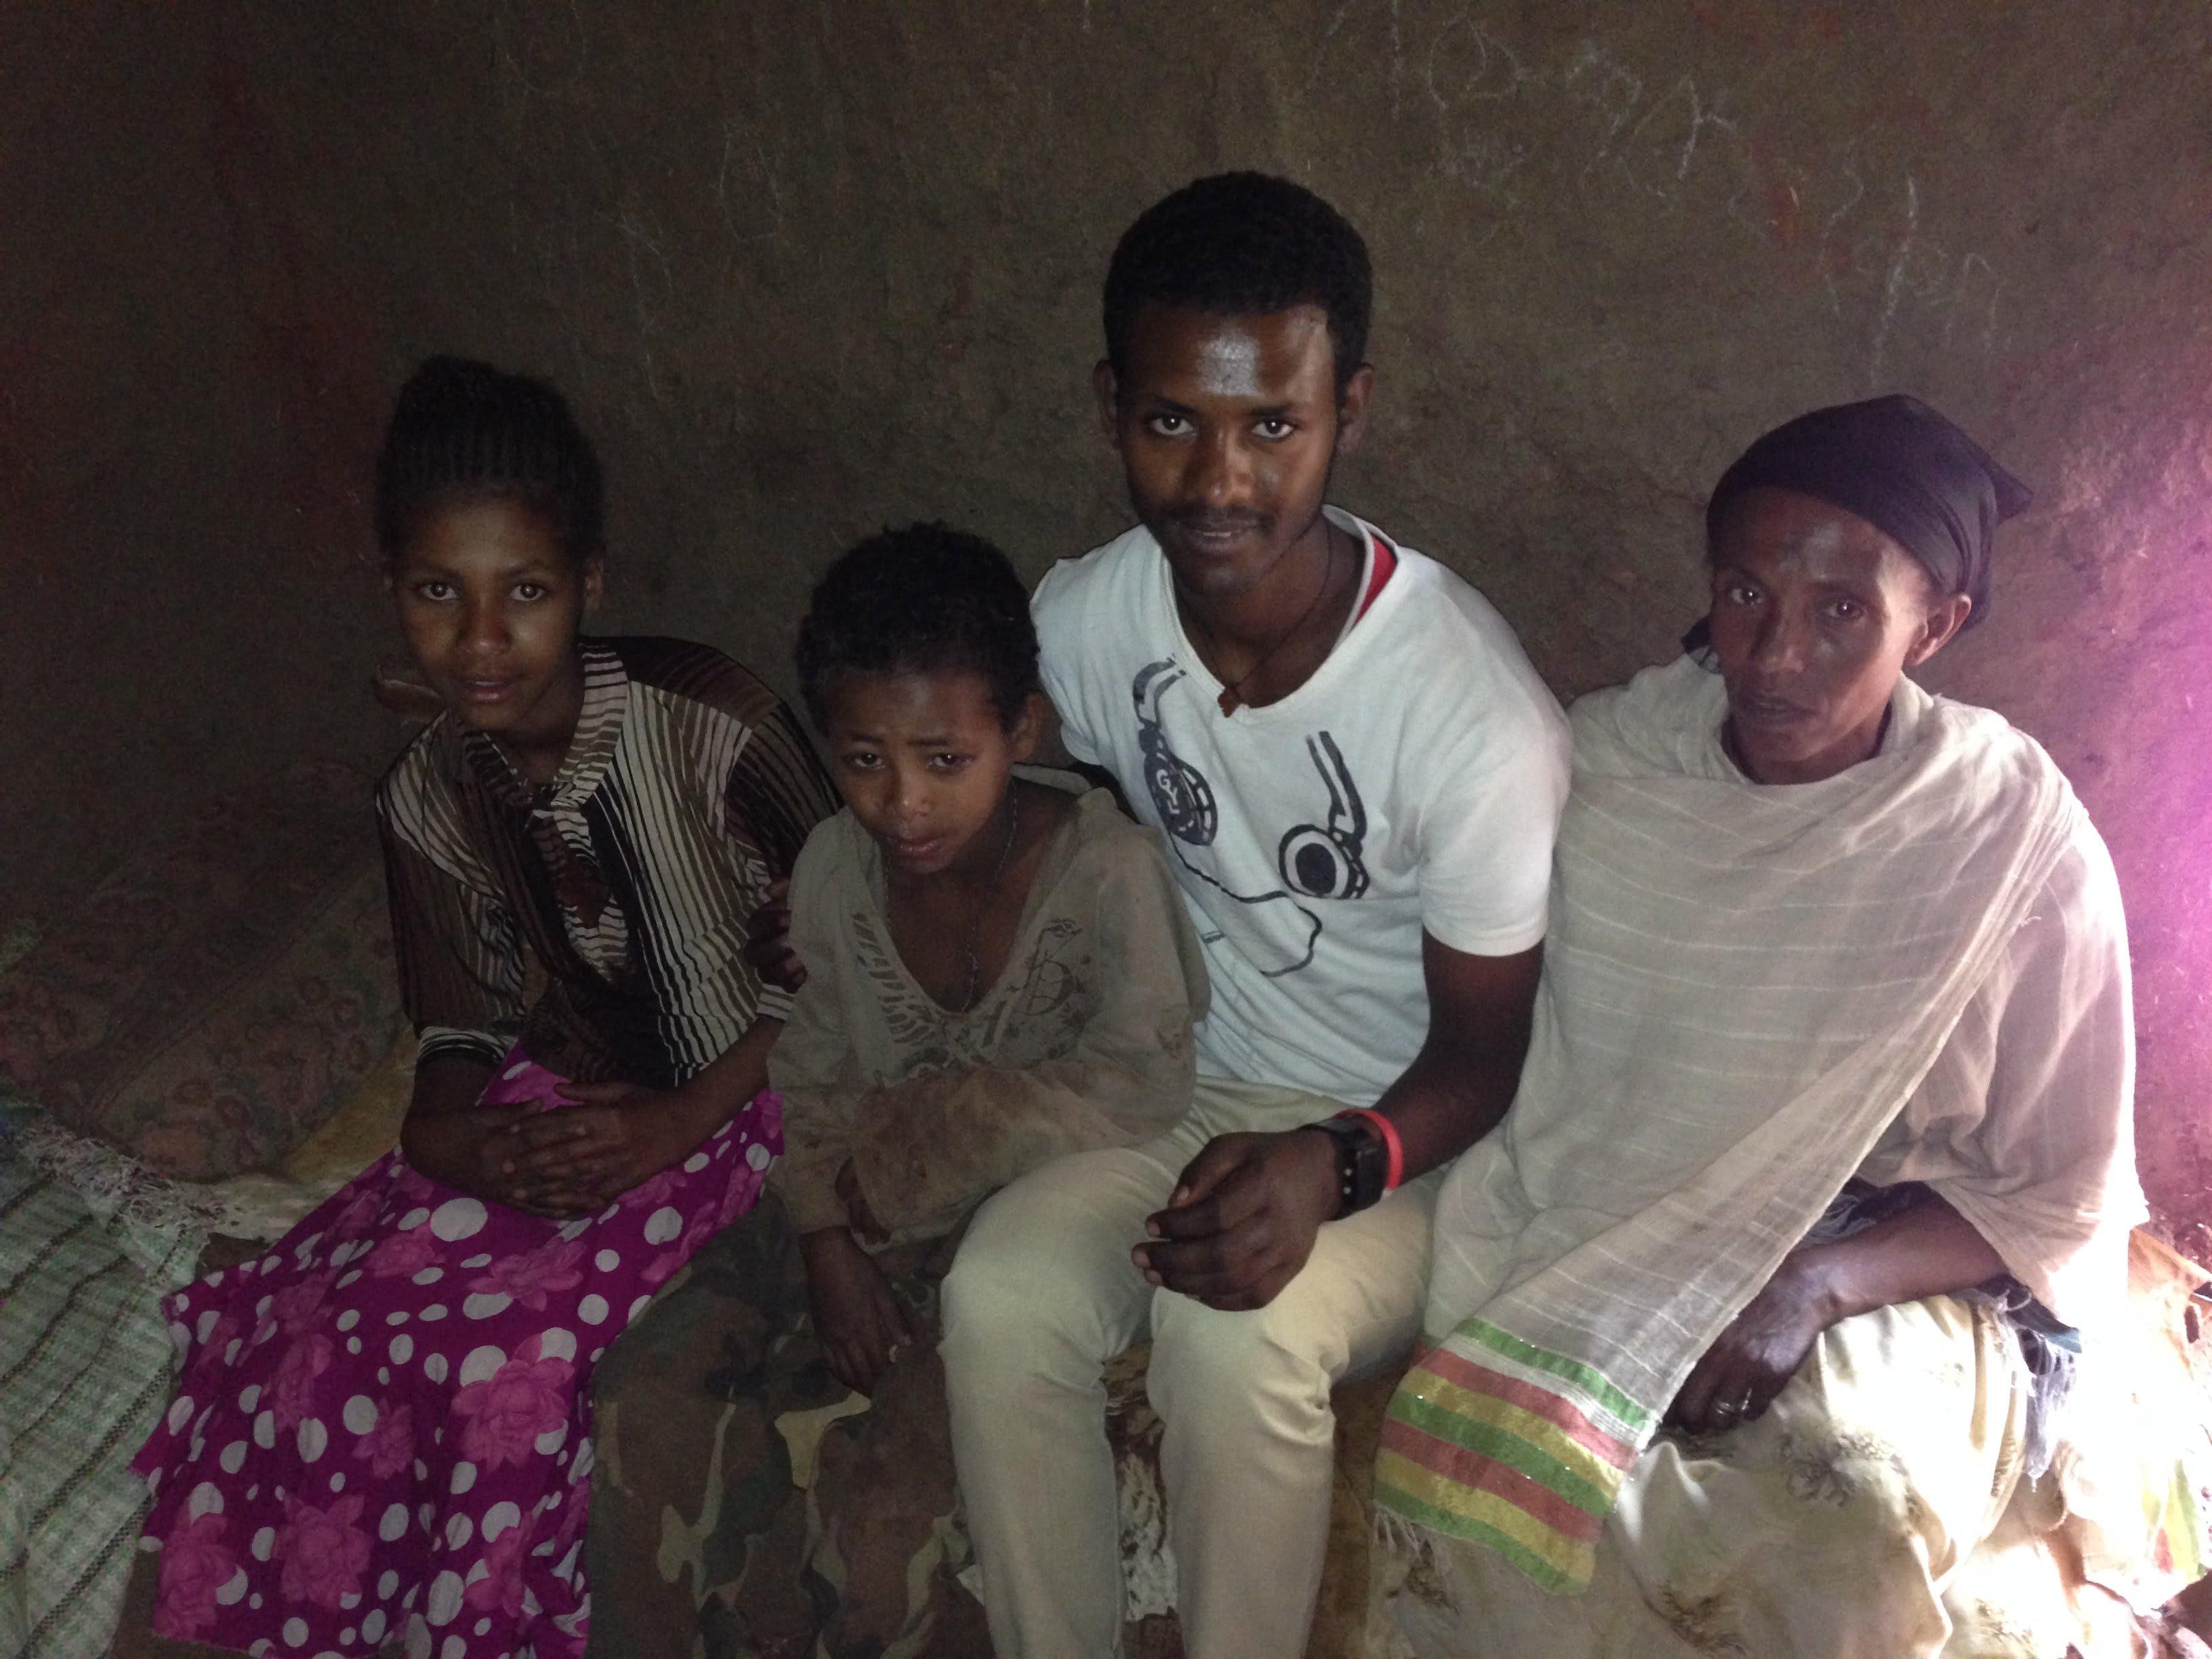 Birhanu_Yalew_with_some_of_his_family_memebers_1_zbdaao